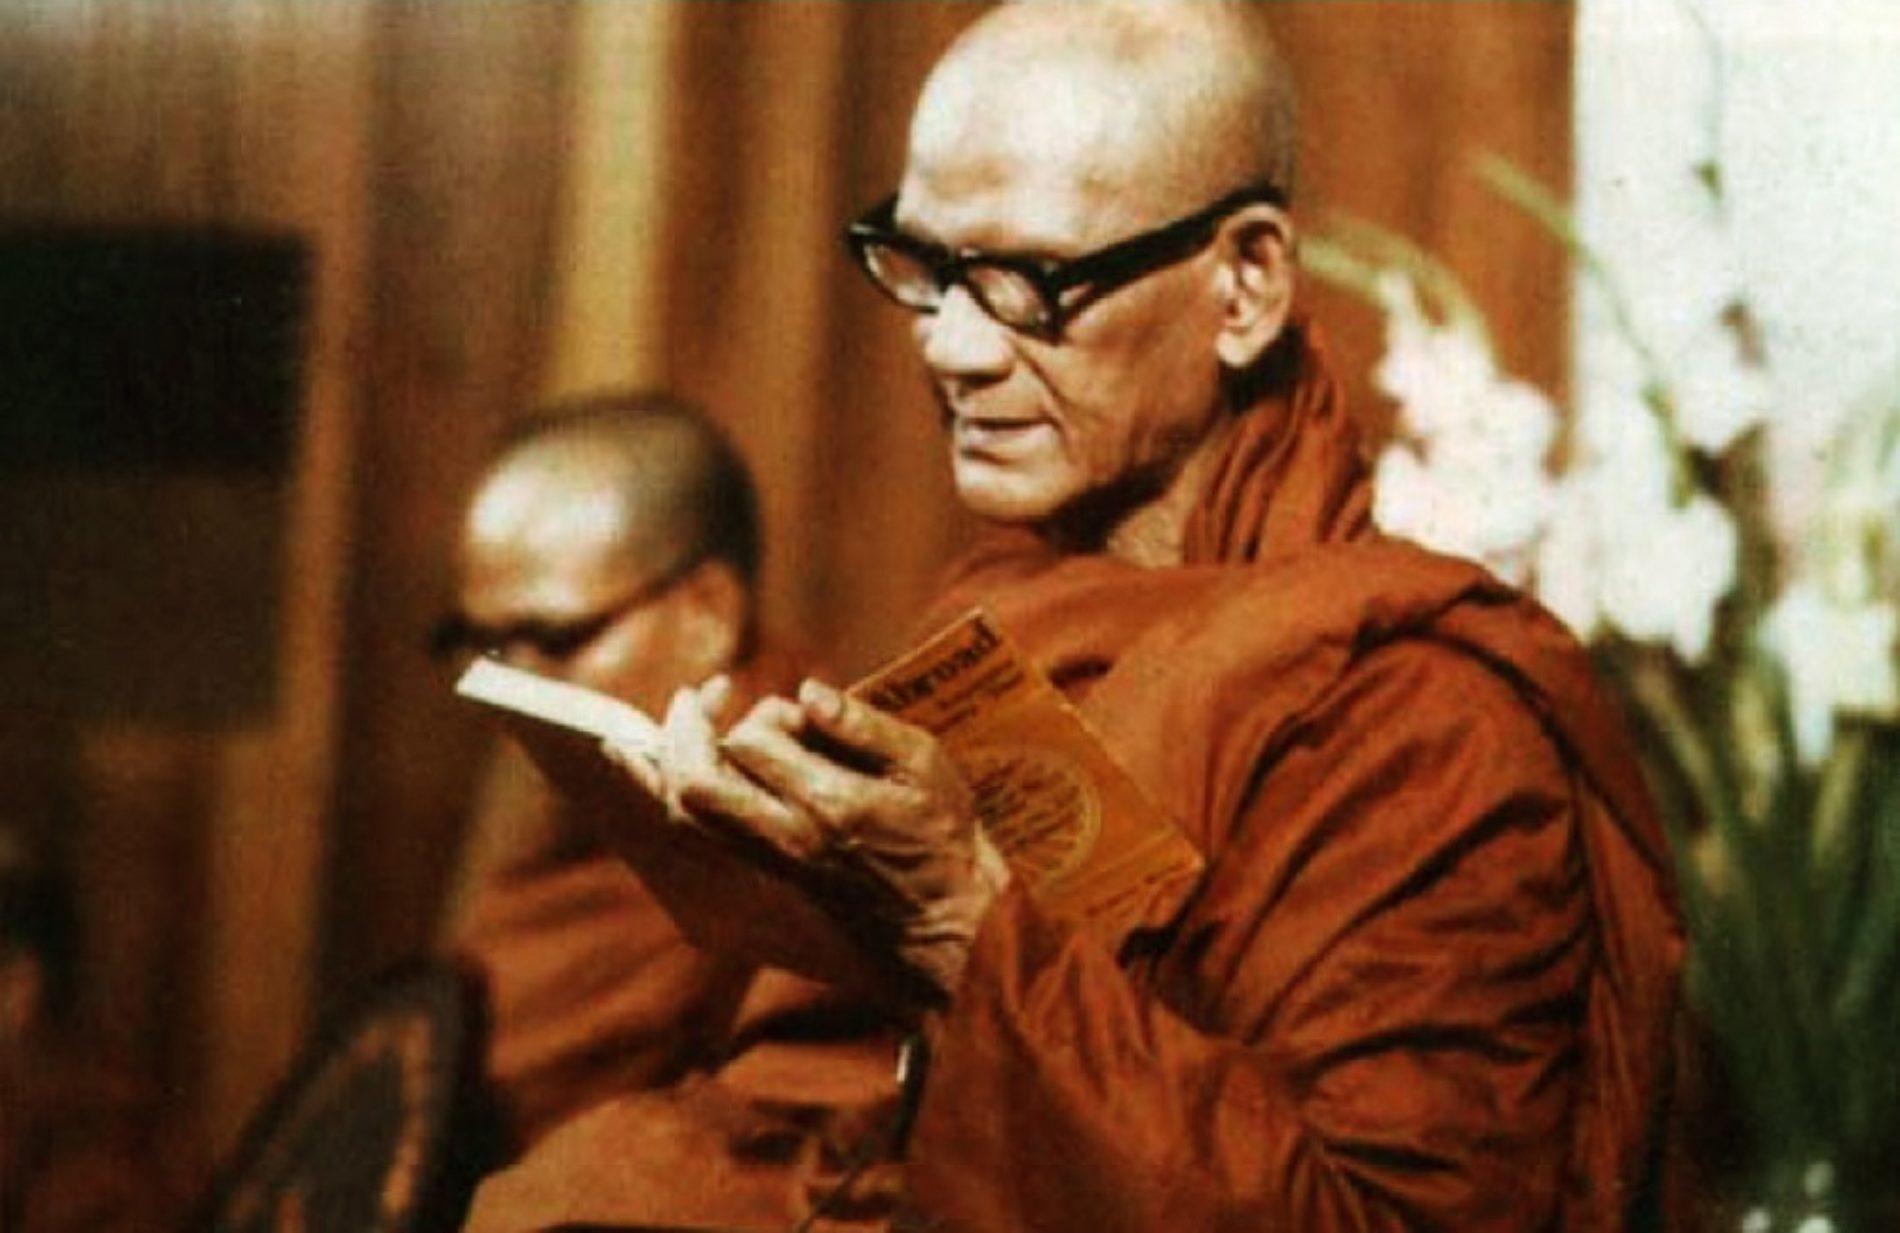 Беседа об Анатта-лаккхана сутте — Махаси Саядо